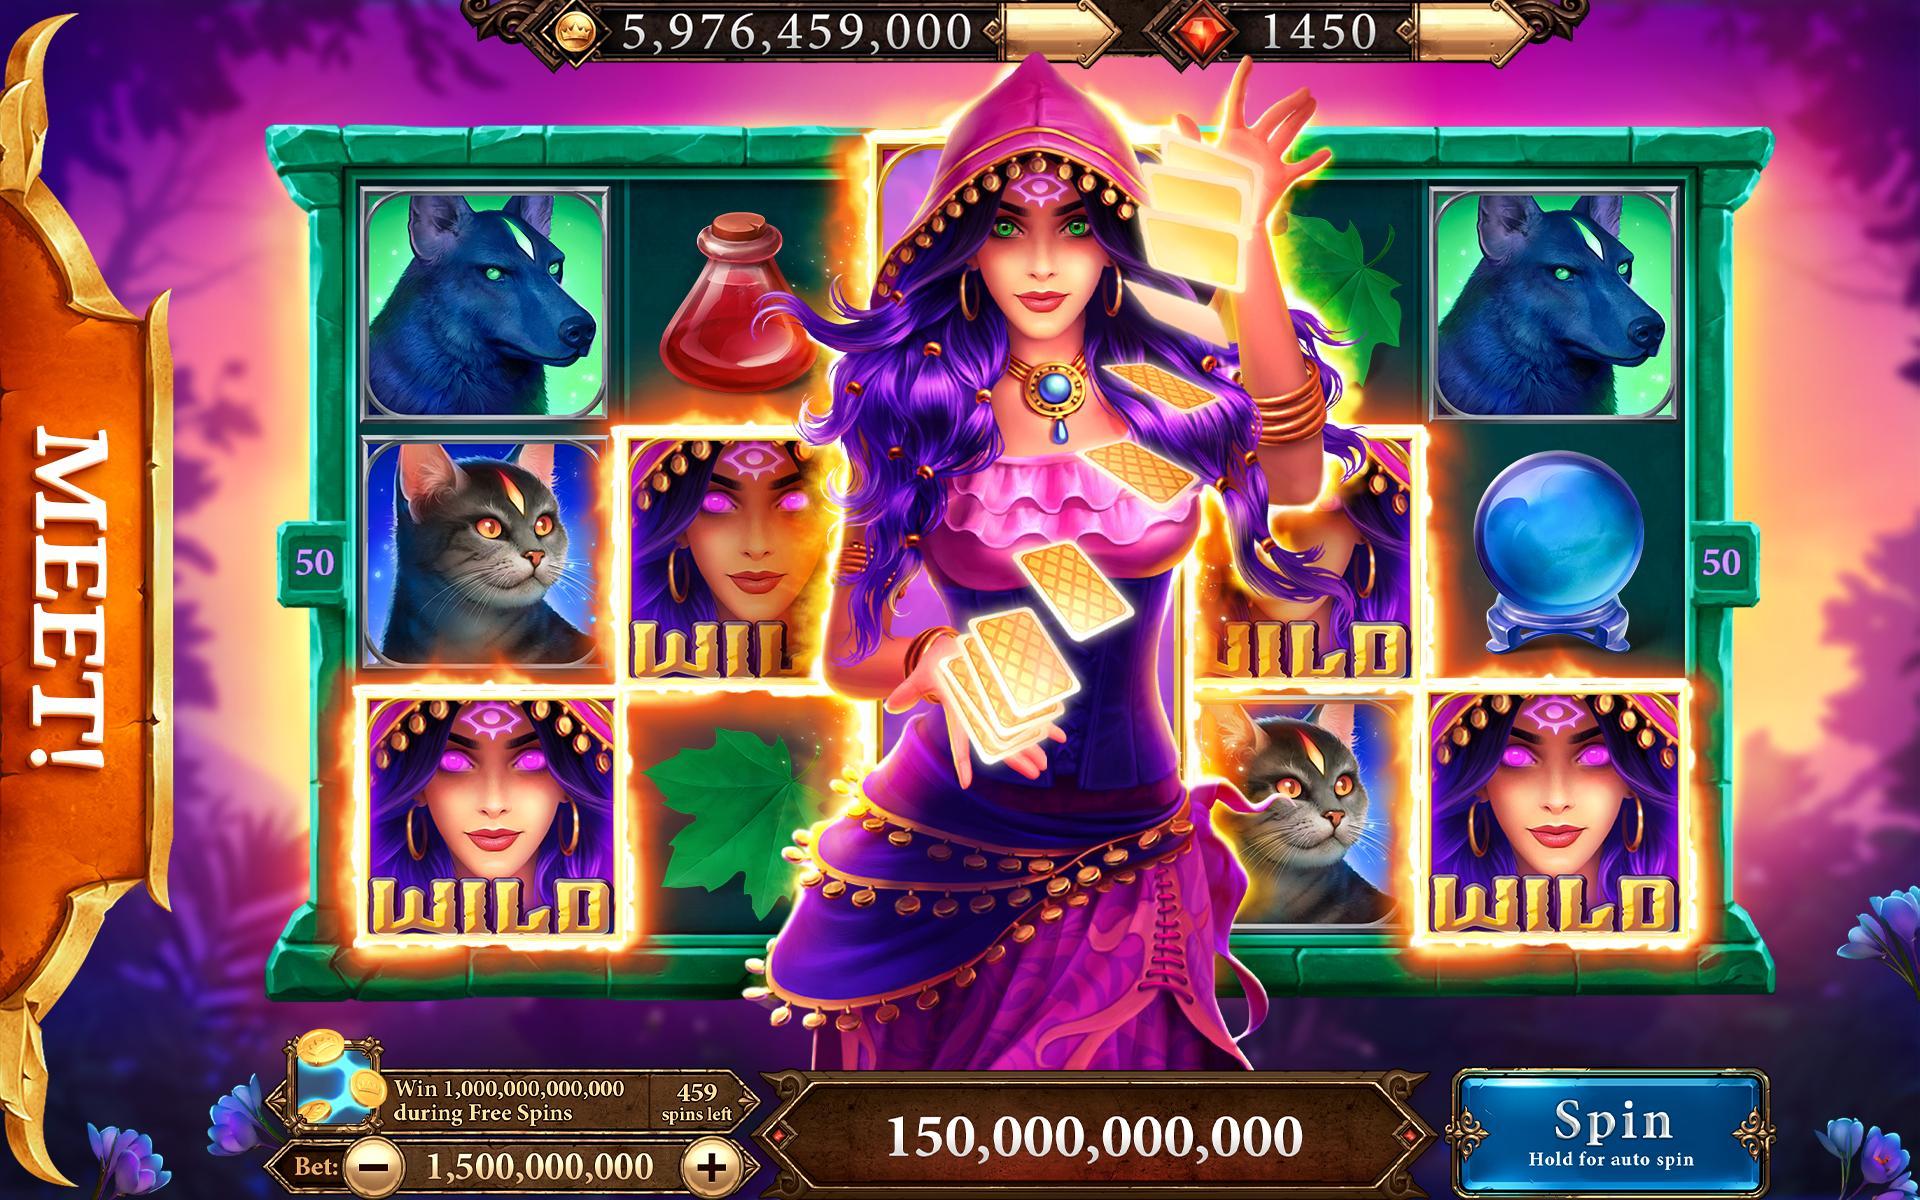 Scatter Slots Las Vegas Casino Game 777 Online 3.87.0 Screenshot 14